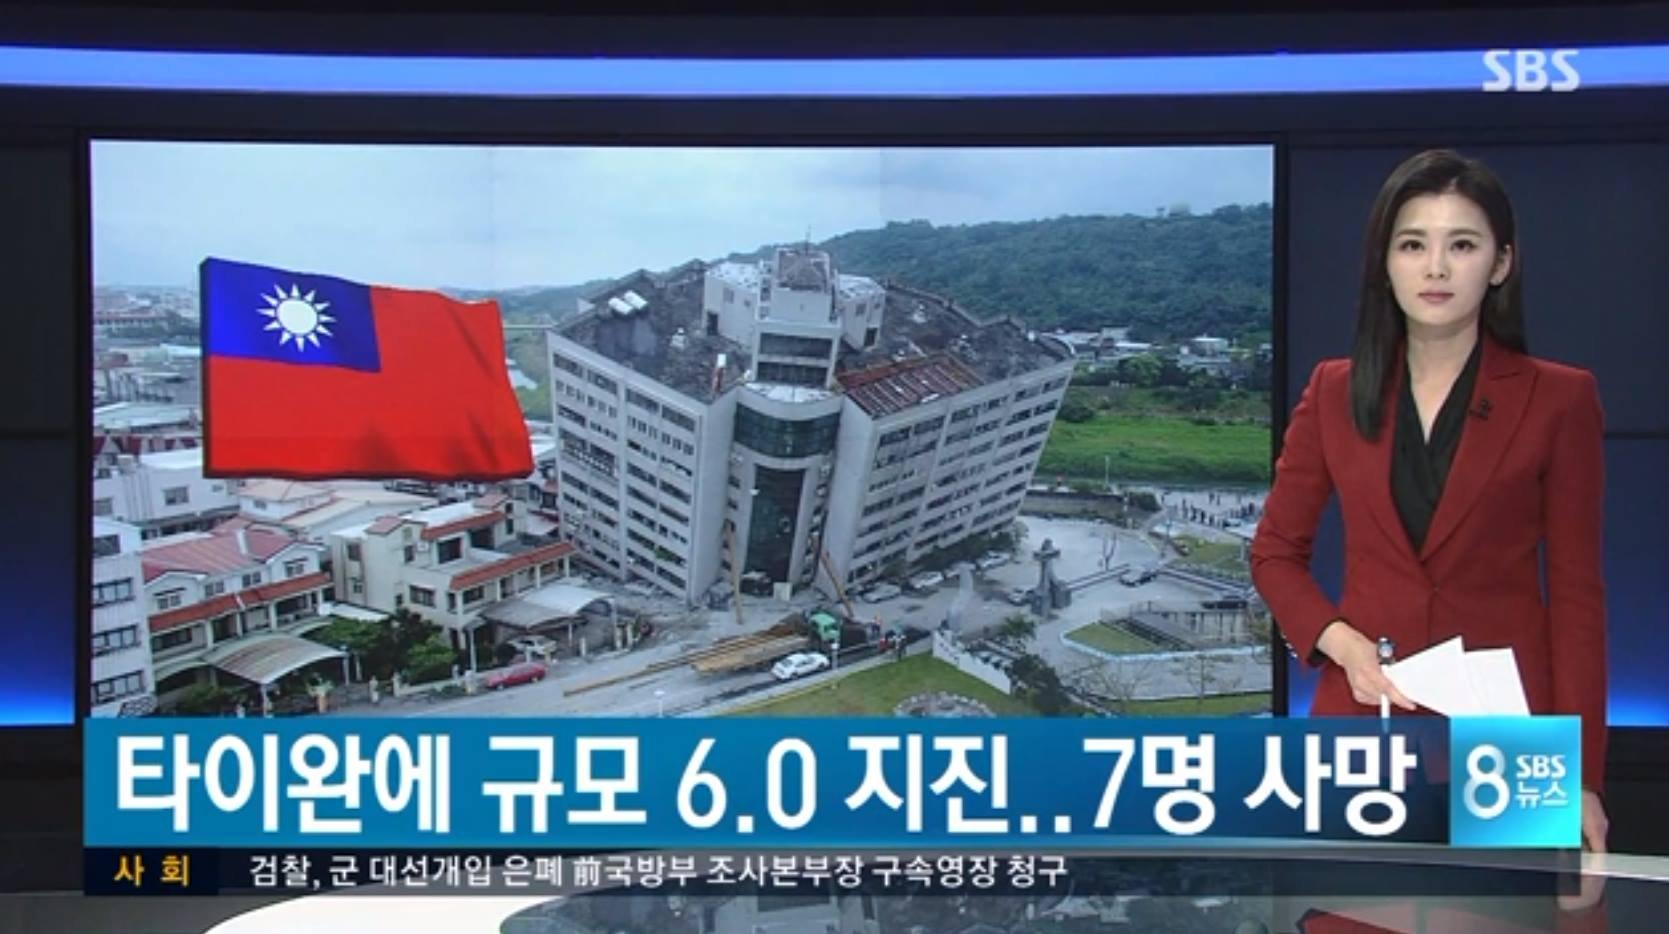 27504118 2009053969357482 5132651776535118653 o - 花蓮強震,韓國藝人、網民集體為台灣集氣「希望平安無事!」